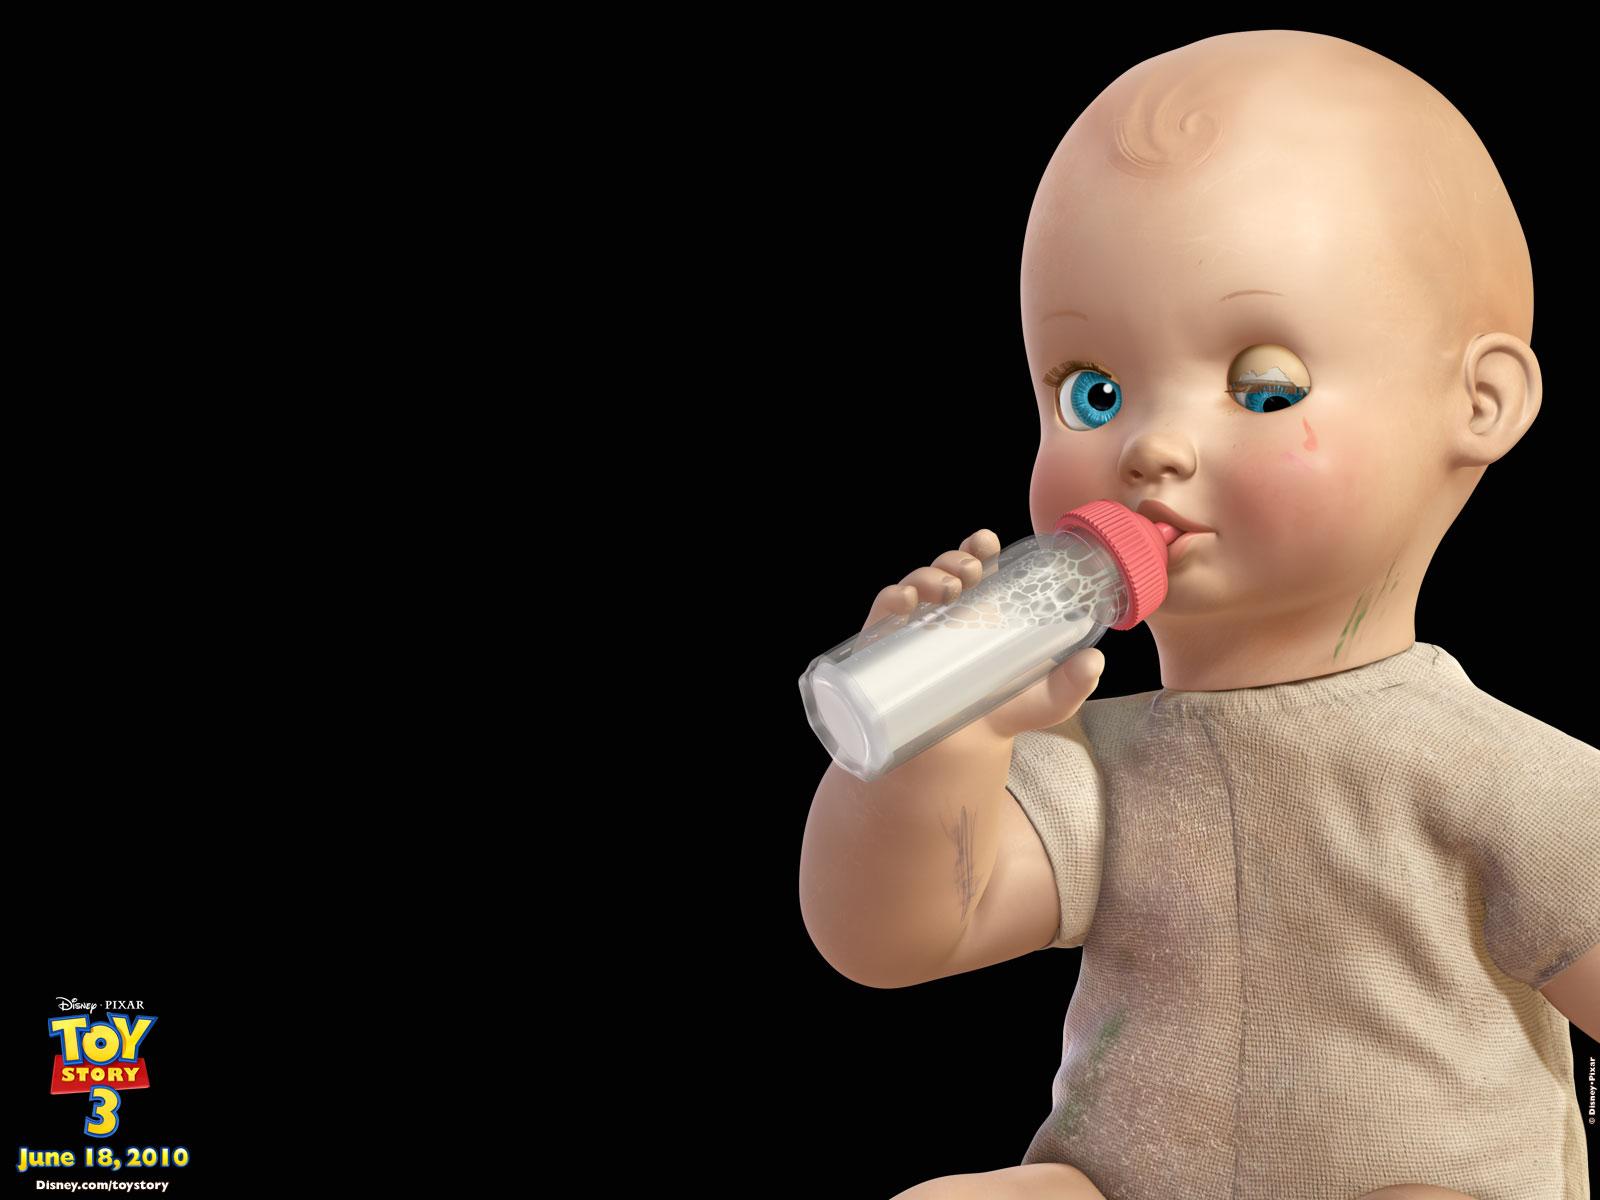 Big Baby Pixar Wiki